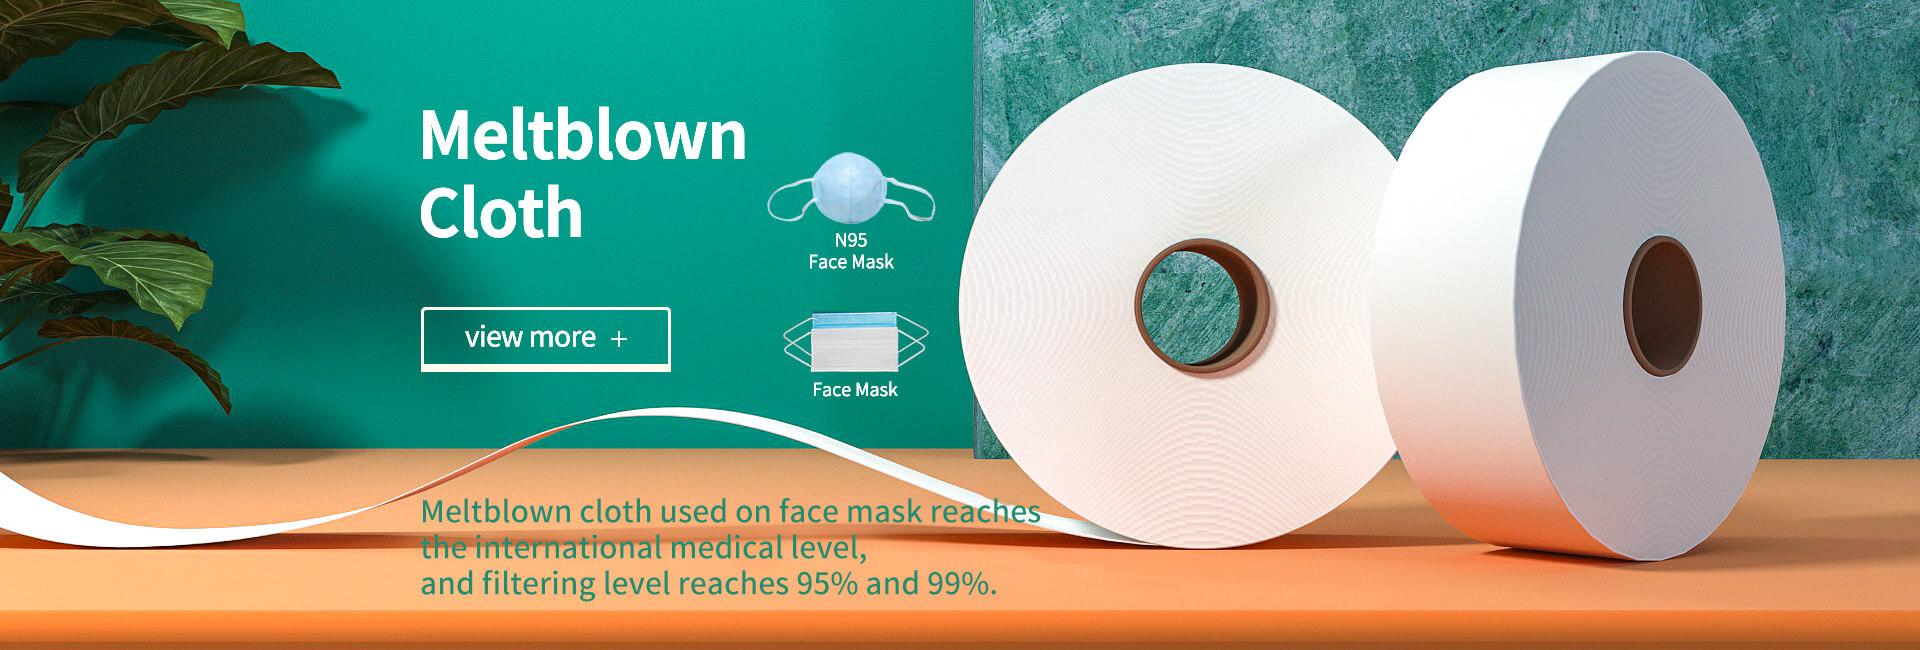 Meltblown cloth